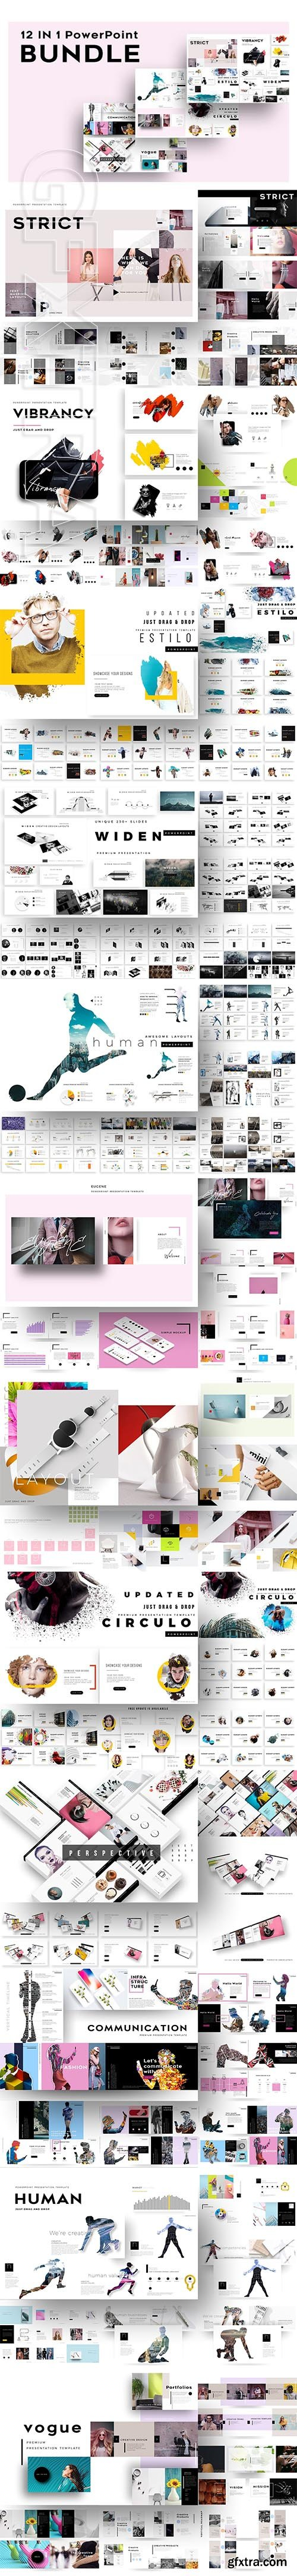 CreativeMarket - 12-IN-1 Creative PowerPoint Bundle 2933014